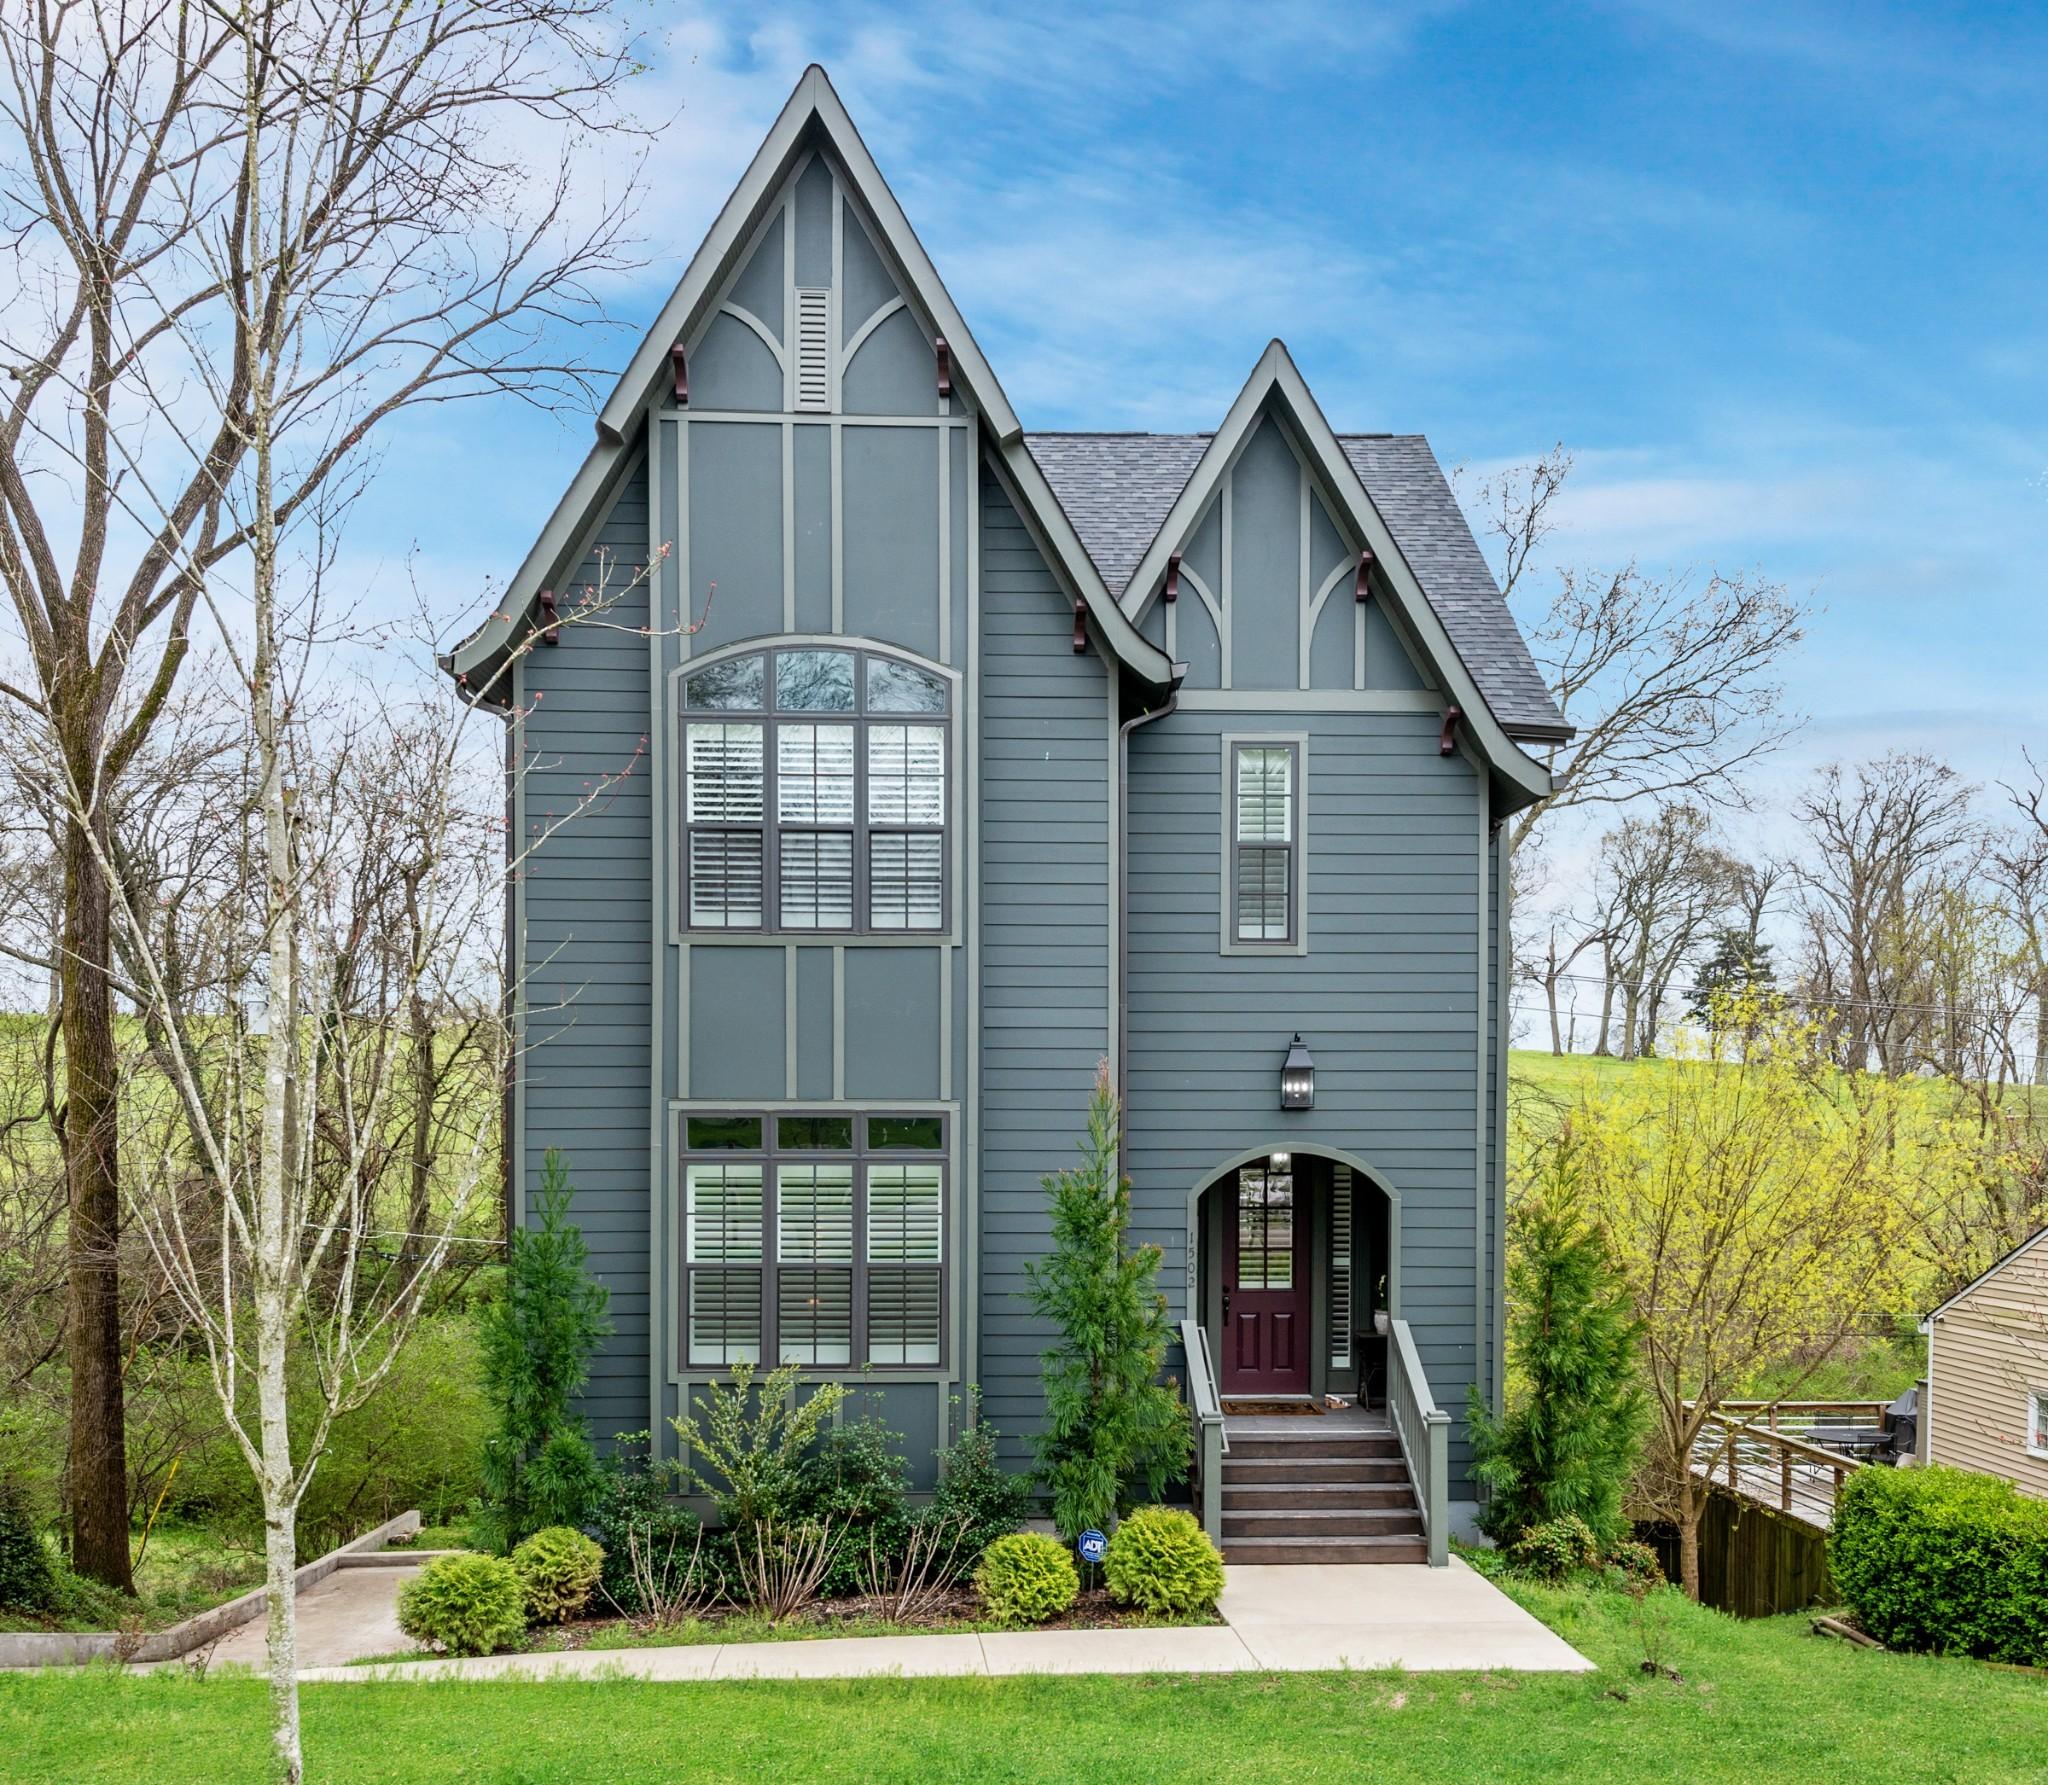 1502 Electric Ave, Nashville, TN 37206 - Nashville, TN real estate listing